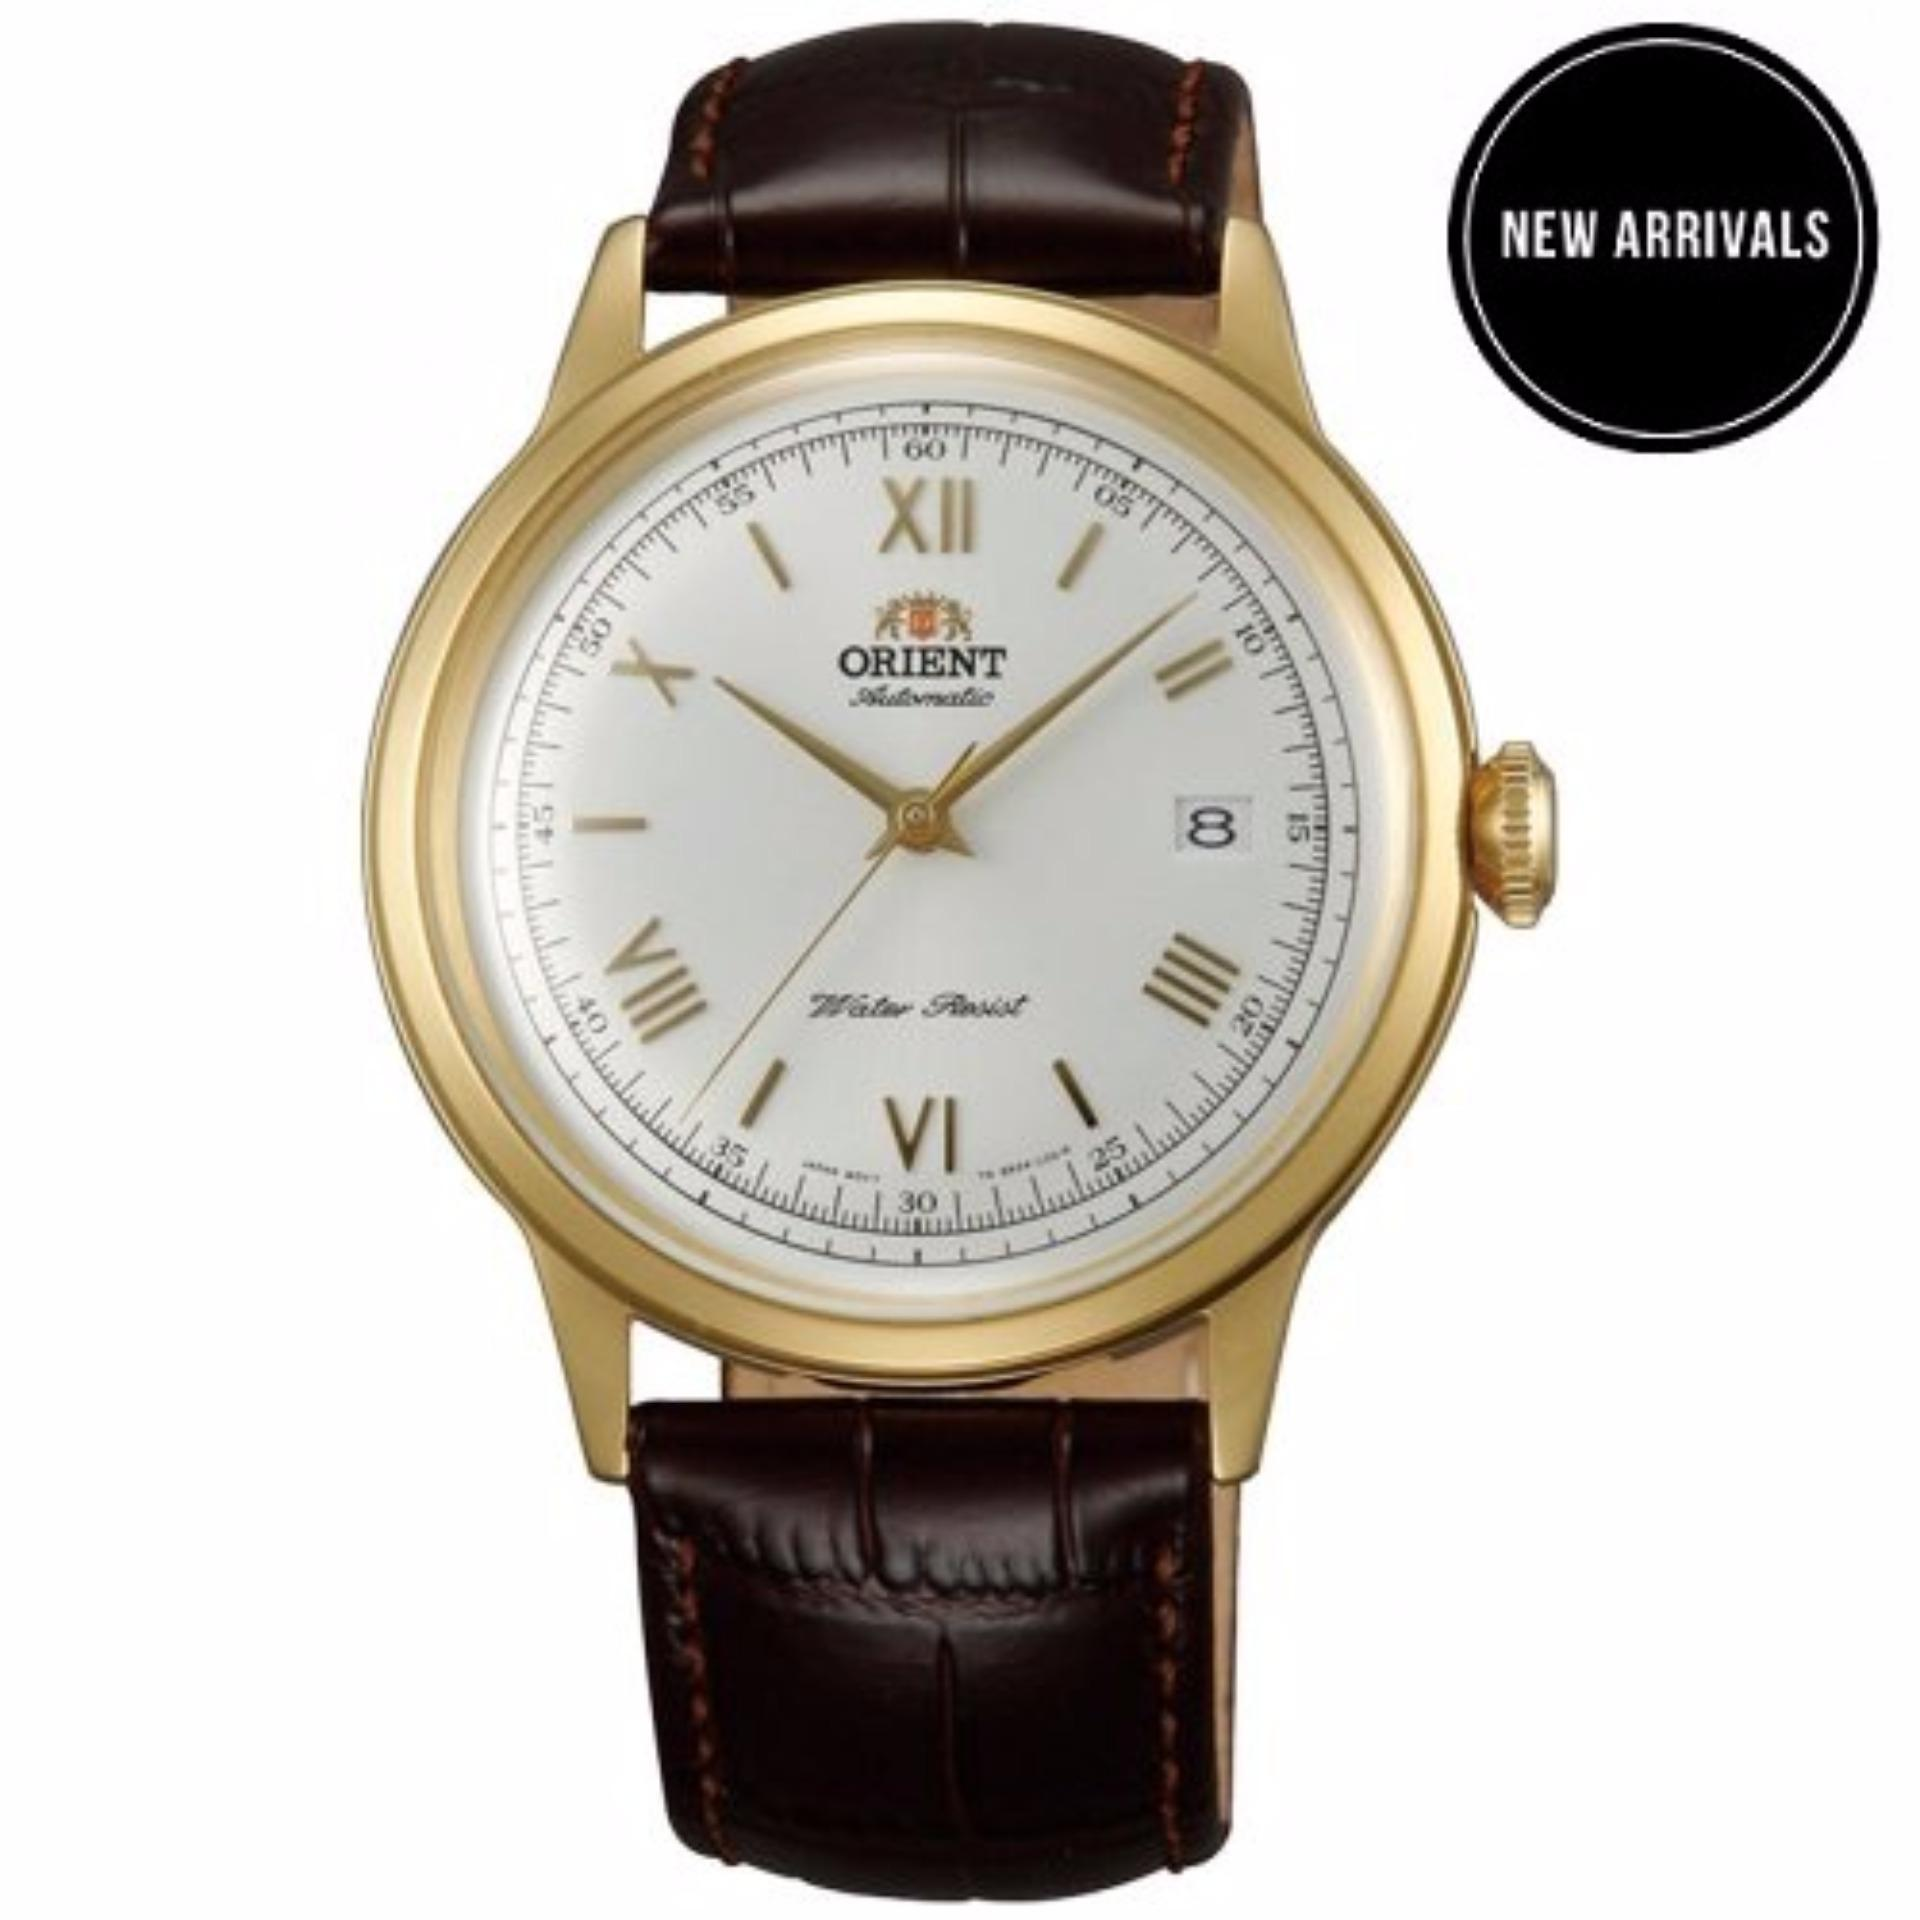 Đồng hồ nam dây da Orient Bambino 2nd Gen Version 2 FAC00007W0